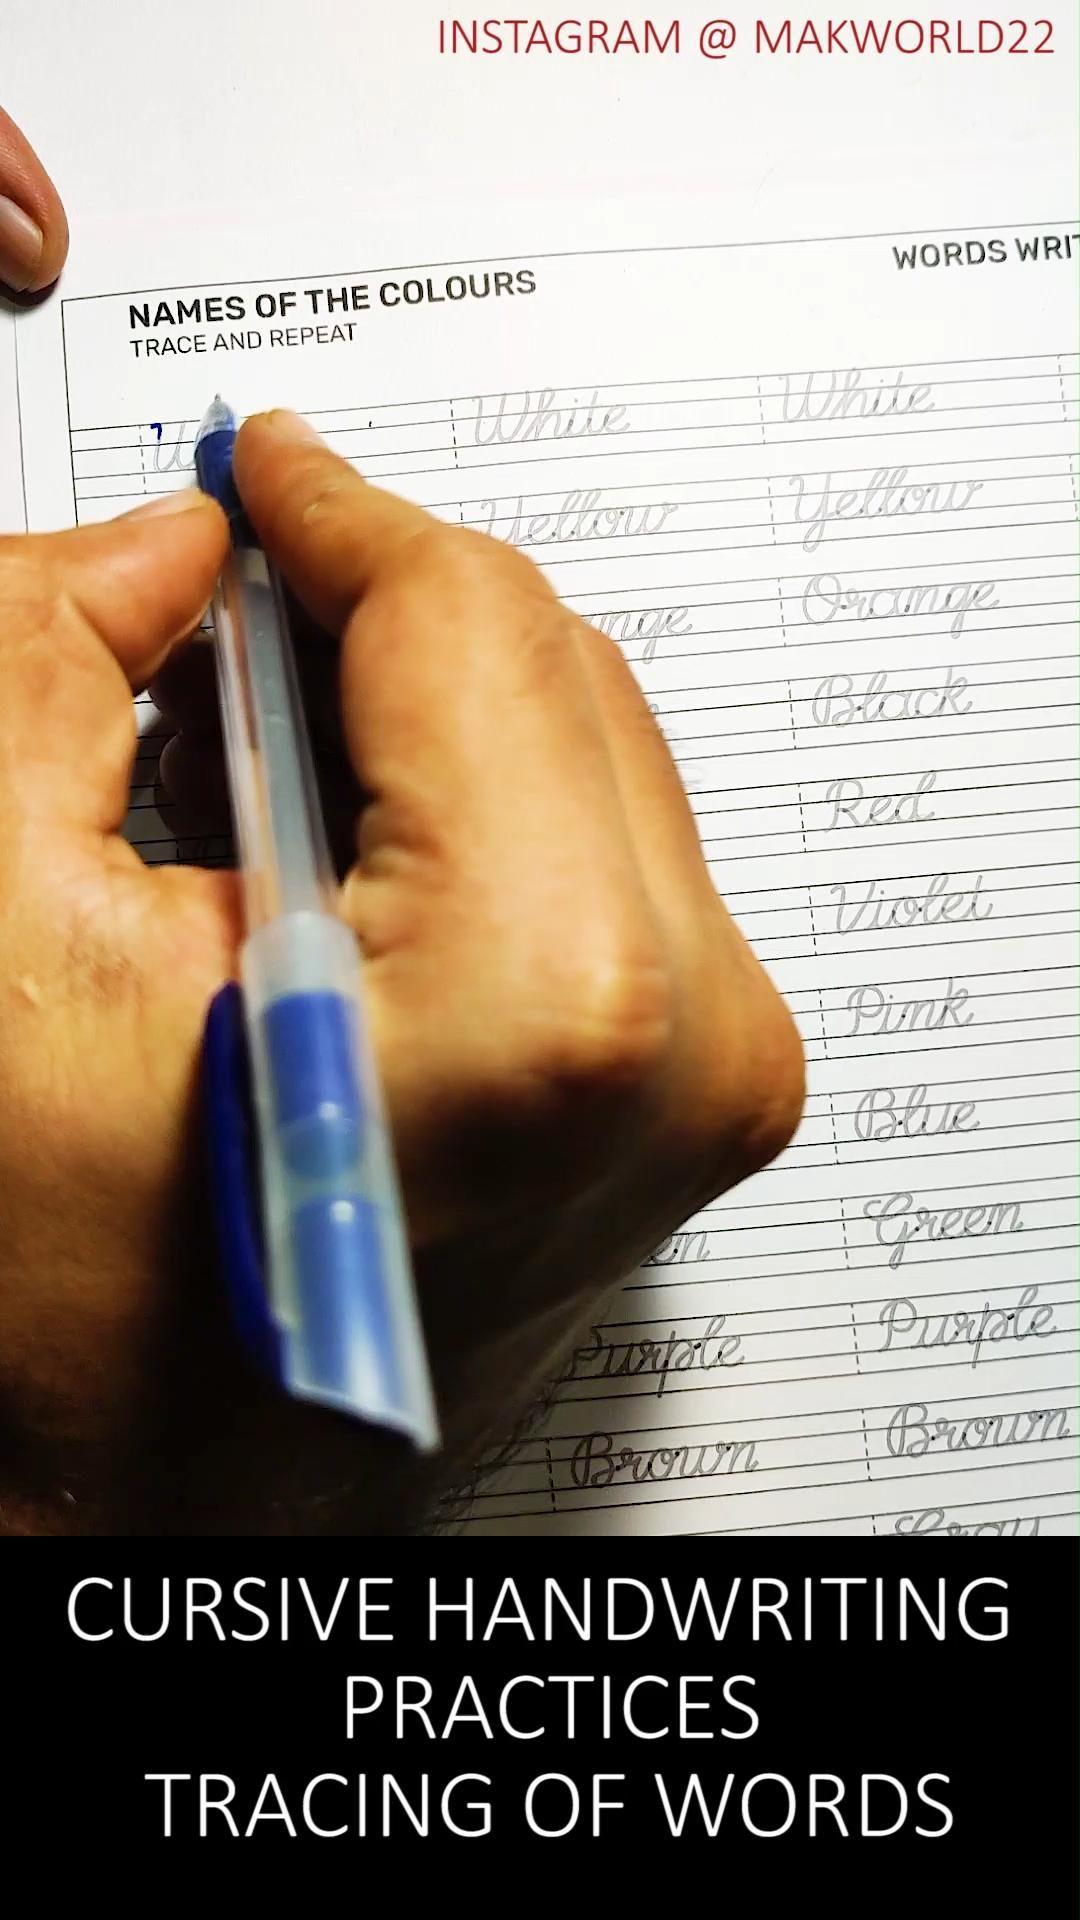 Printable Cursive Handwriting Worksheets Printable Etsy Video Video Cursive Handwriting Cursive Writing Cursive Handwriting Worksheets [ 1920 x 1080 Pixel ]